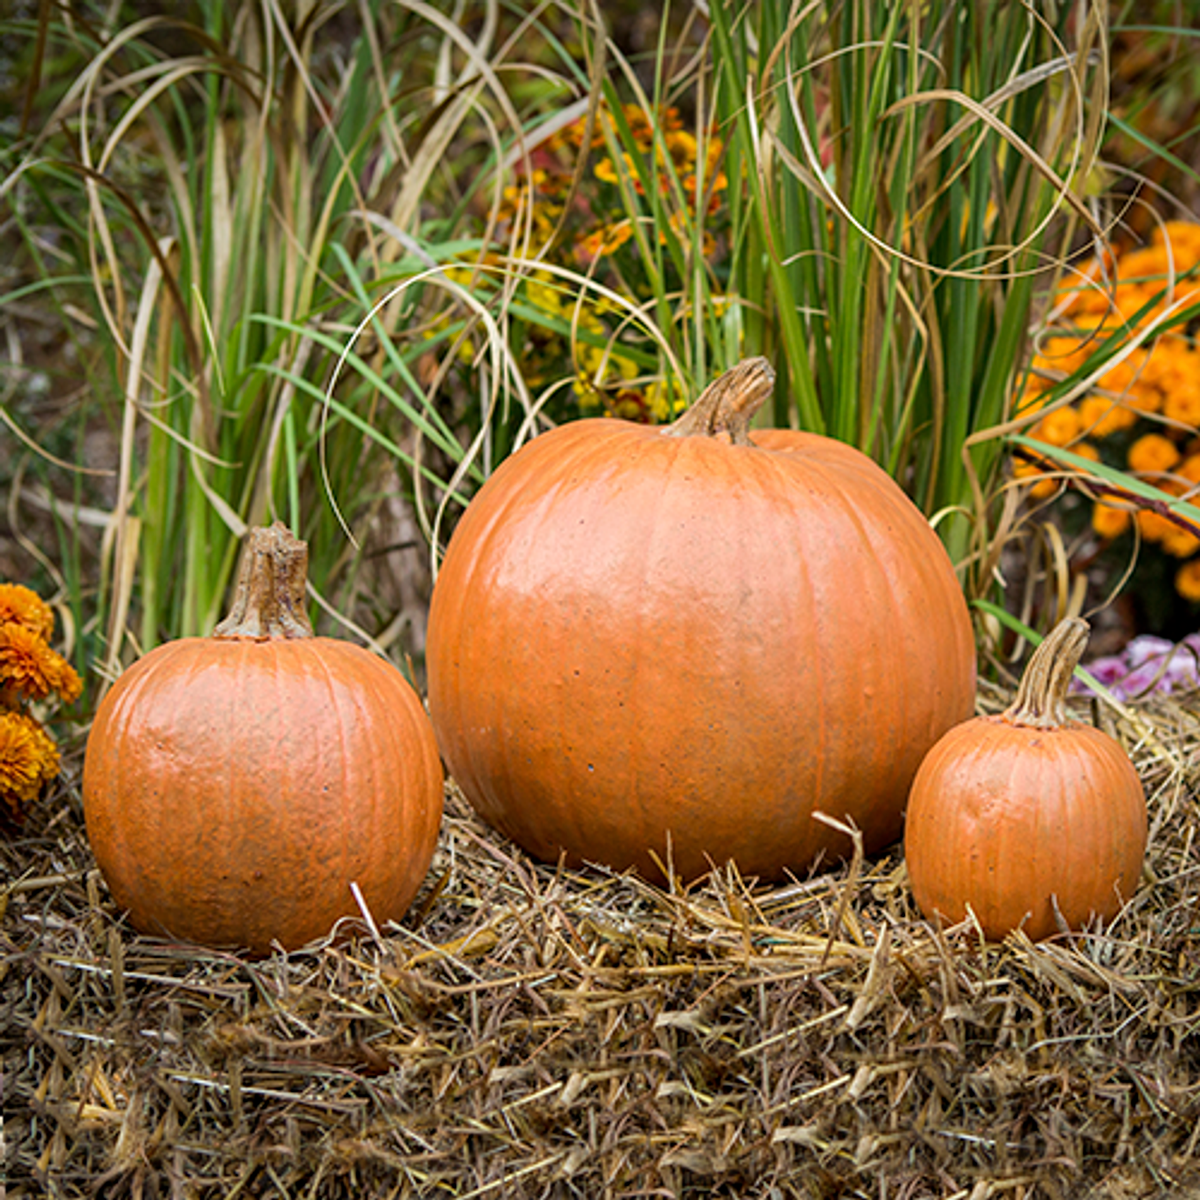 Cement Pumpkins, DIY concrete Pumpkins, Set of 3 Stone Pumpkins Stone Pumpkins Athena Garden, Cast stone garden pumpkins, outdoor concrete pumpkins, halloween outdoor decorations, Fall Pumpkin Decor